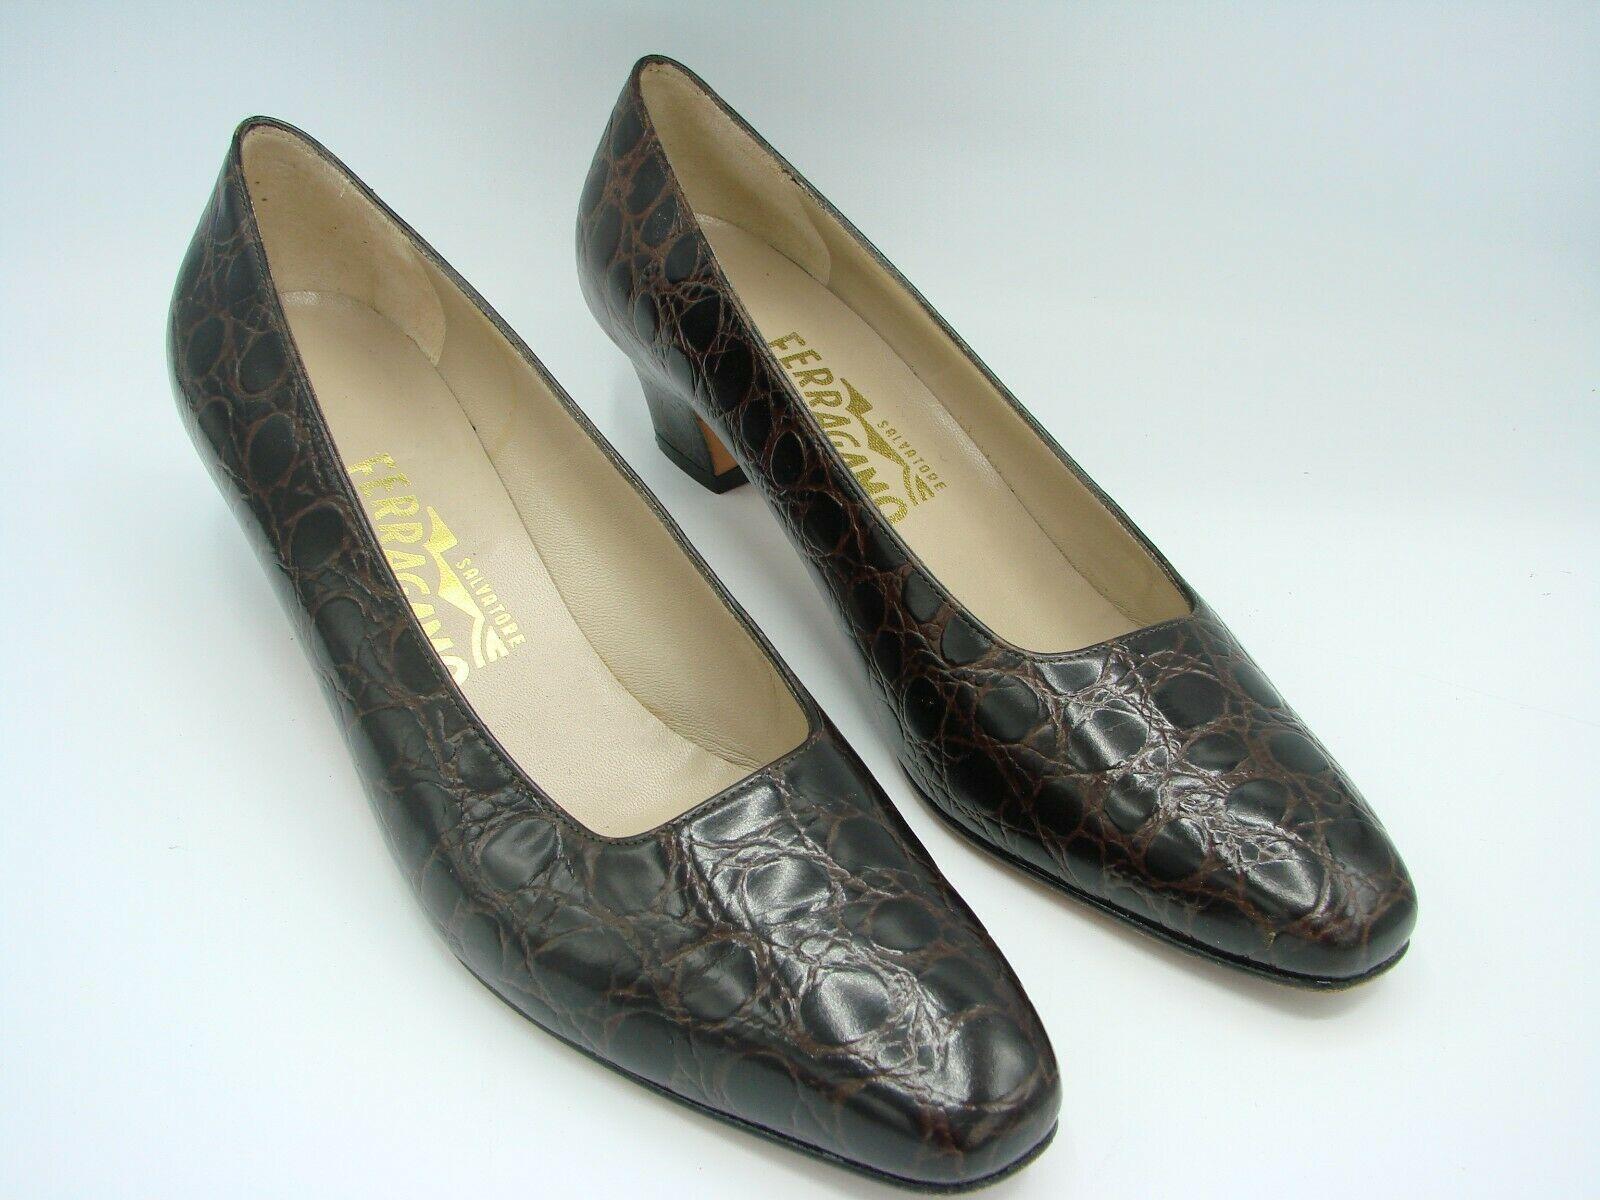 SALVATORE FERRAGAMO Women Shoes Polished Genuine Leather  8 1/2 AA 17666-149 image 2